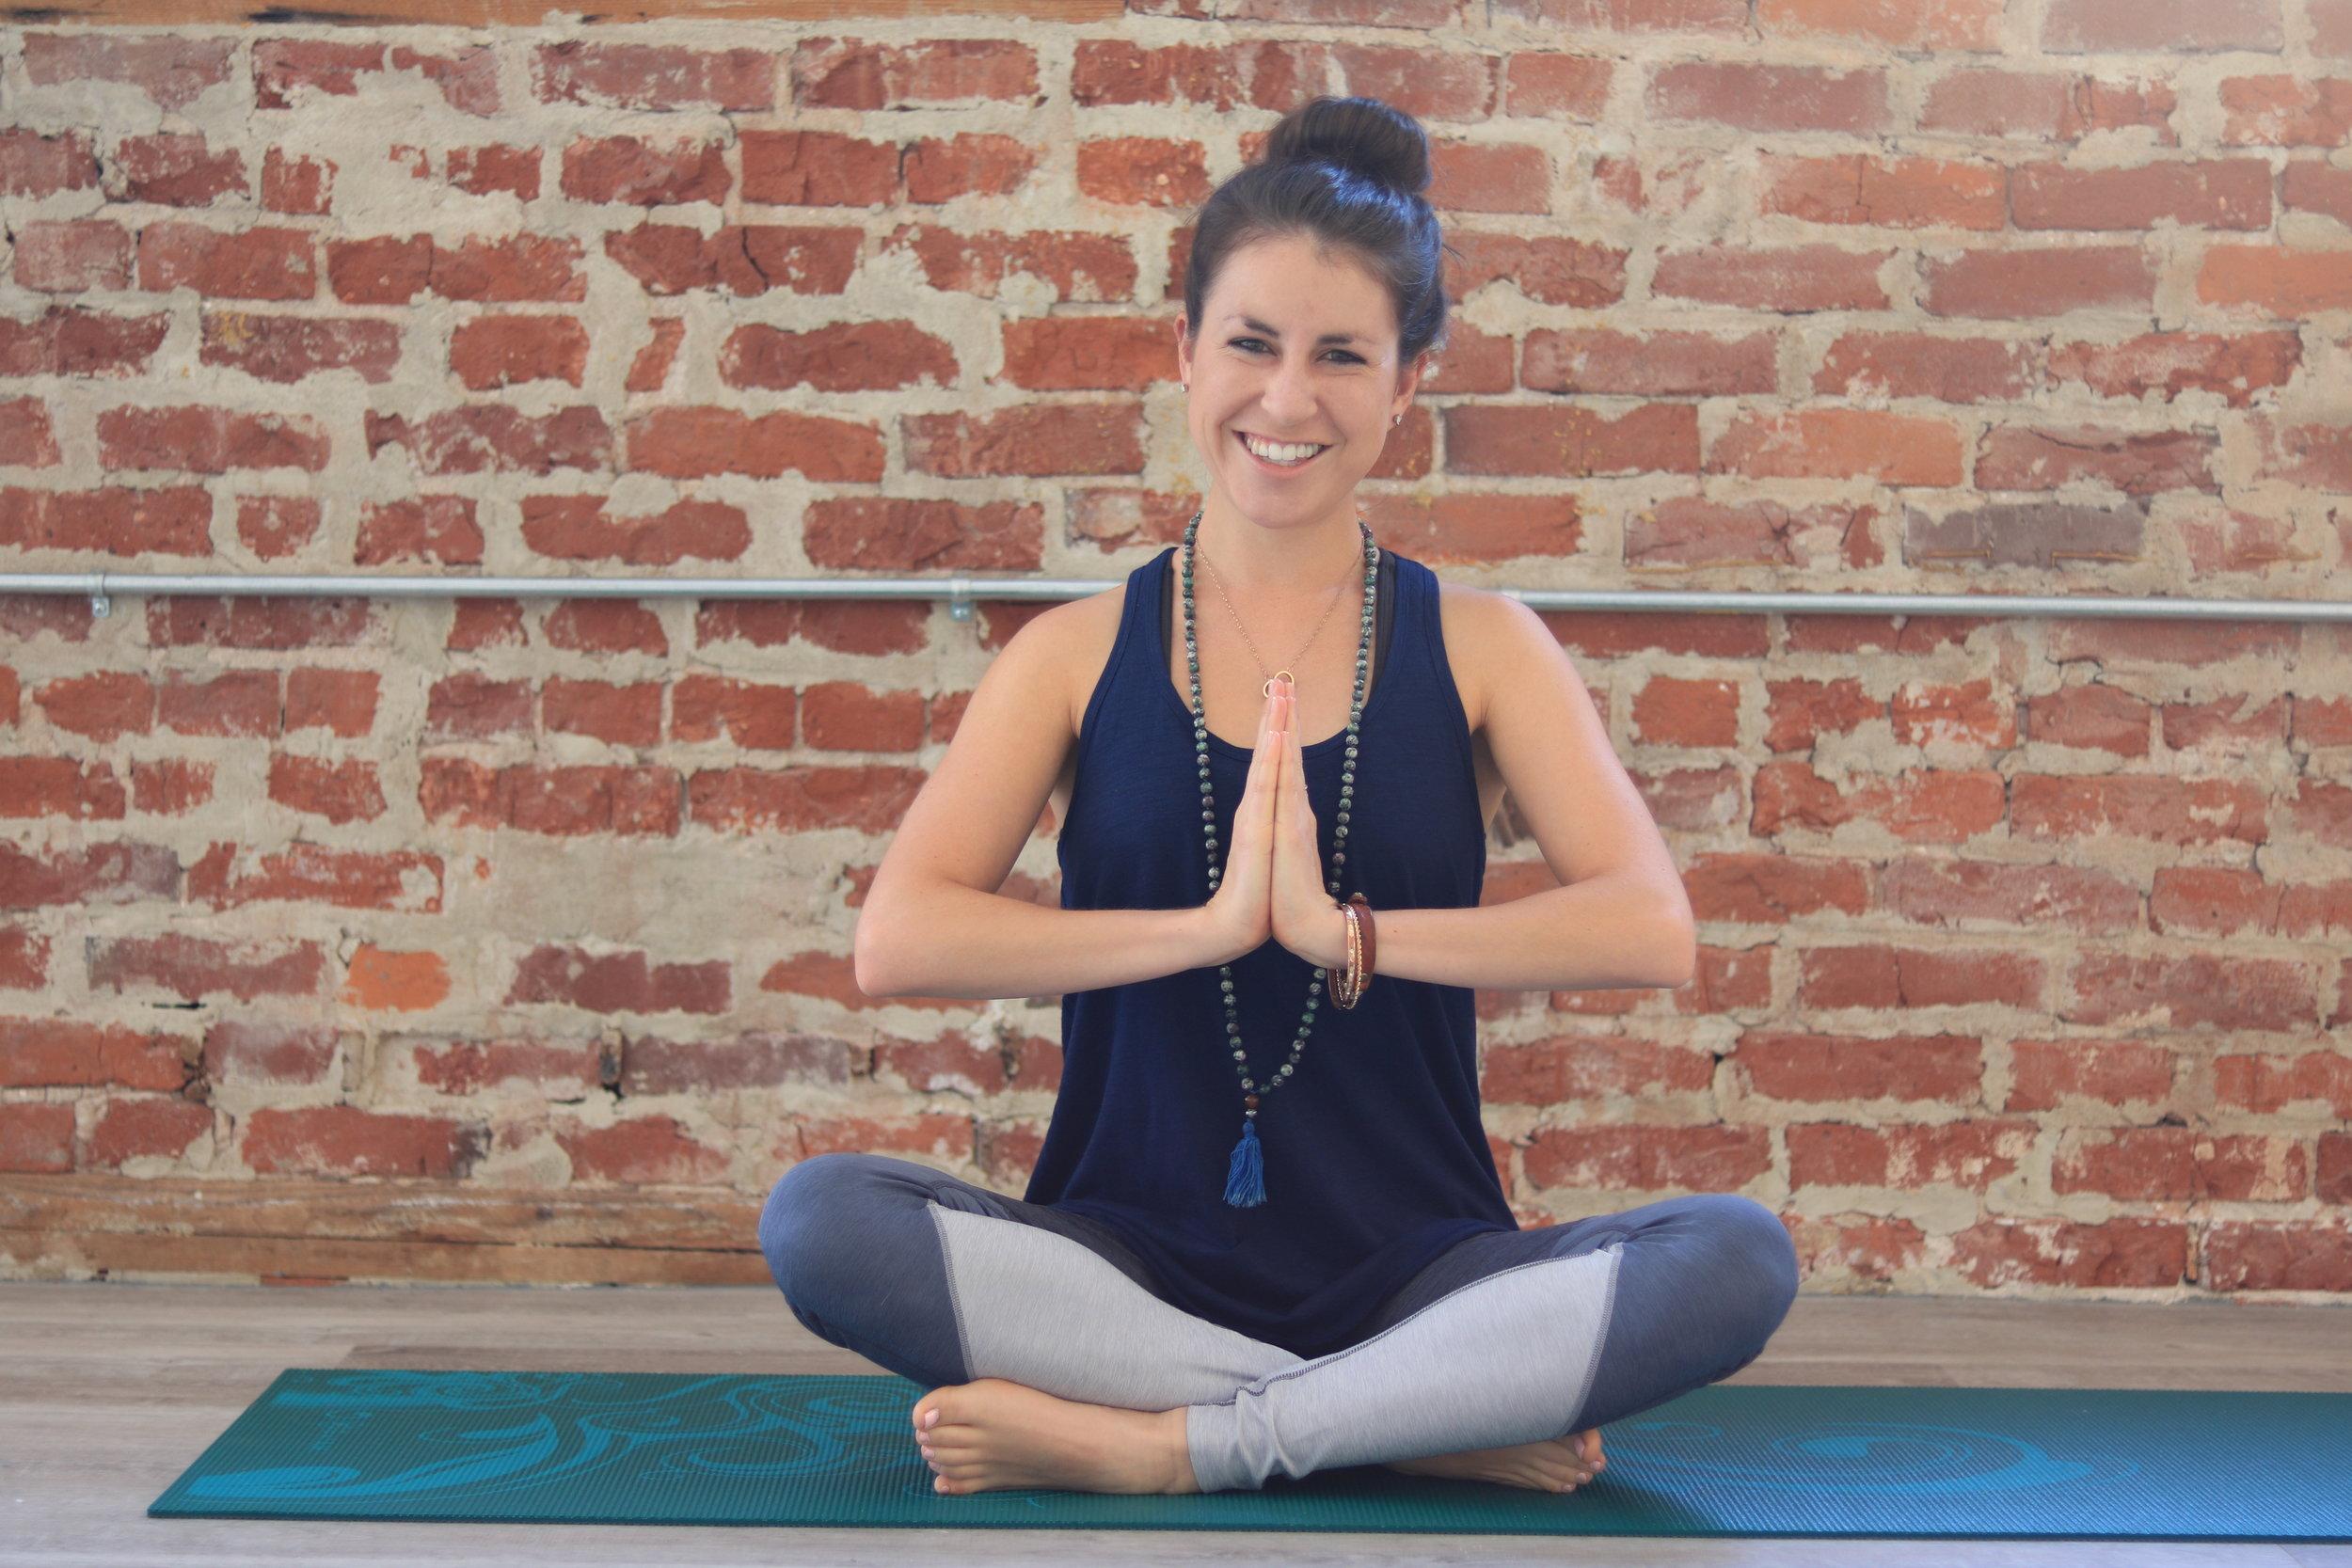 allison-evelyn-gower-yoga-teacher-san-diego-yoga-workshops